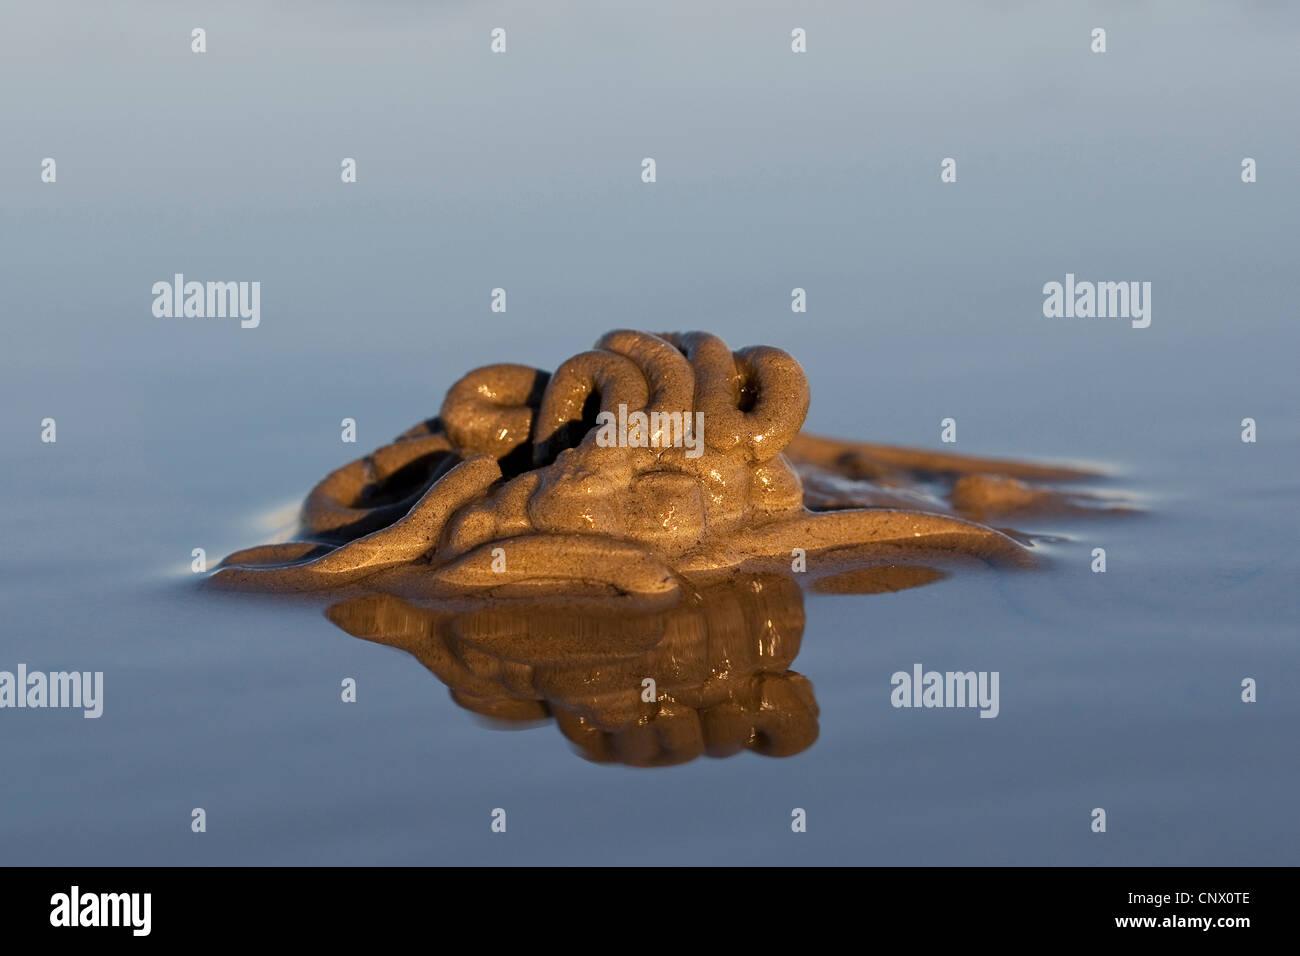 European lug worm, blow lug, lugworm (Arenicola marina), faeces in the wadden sea, Germany - Stock Image